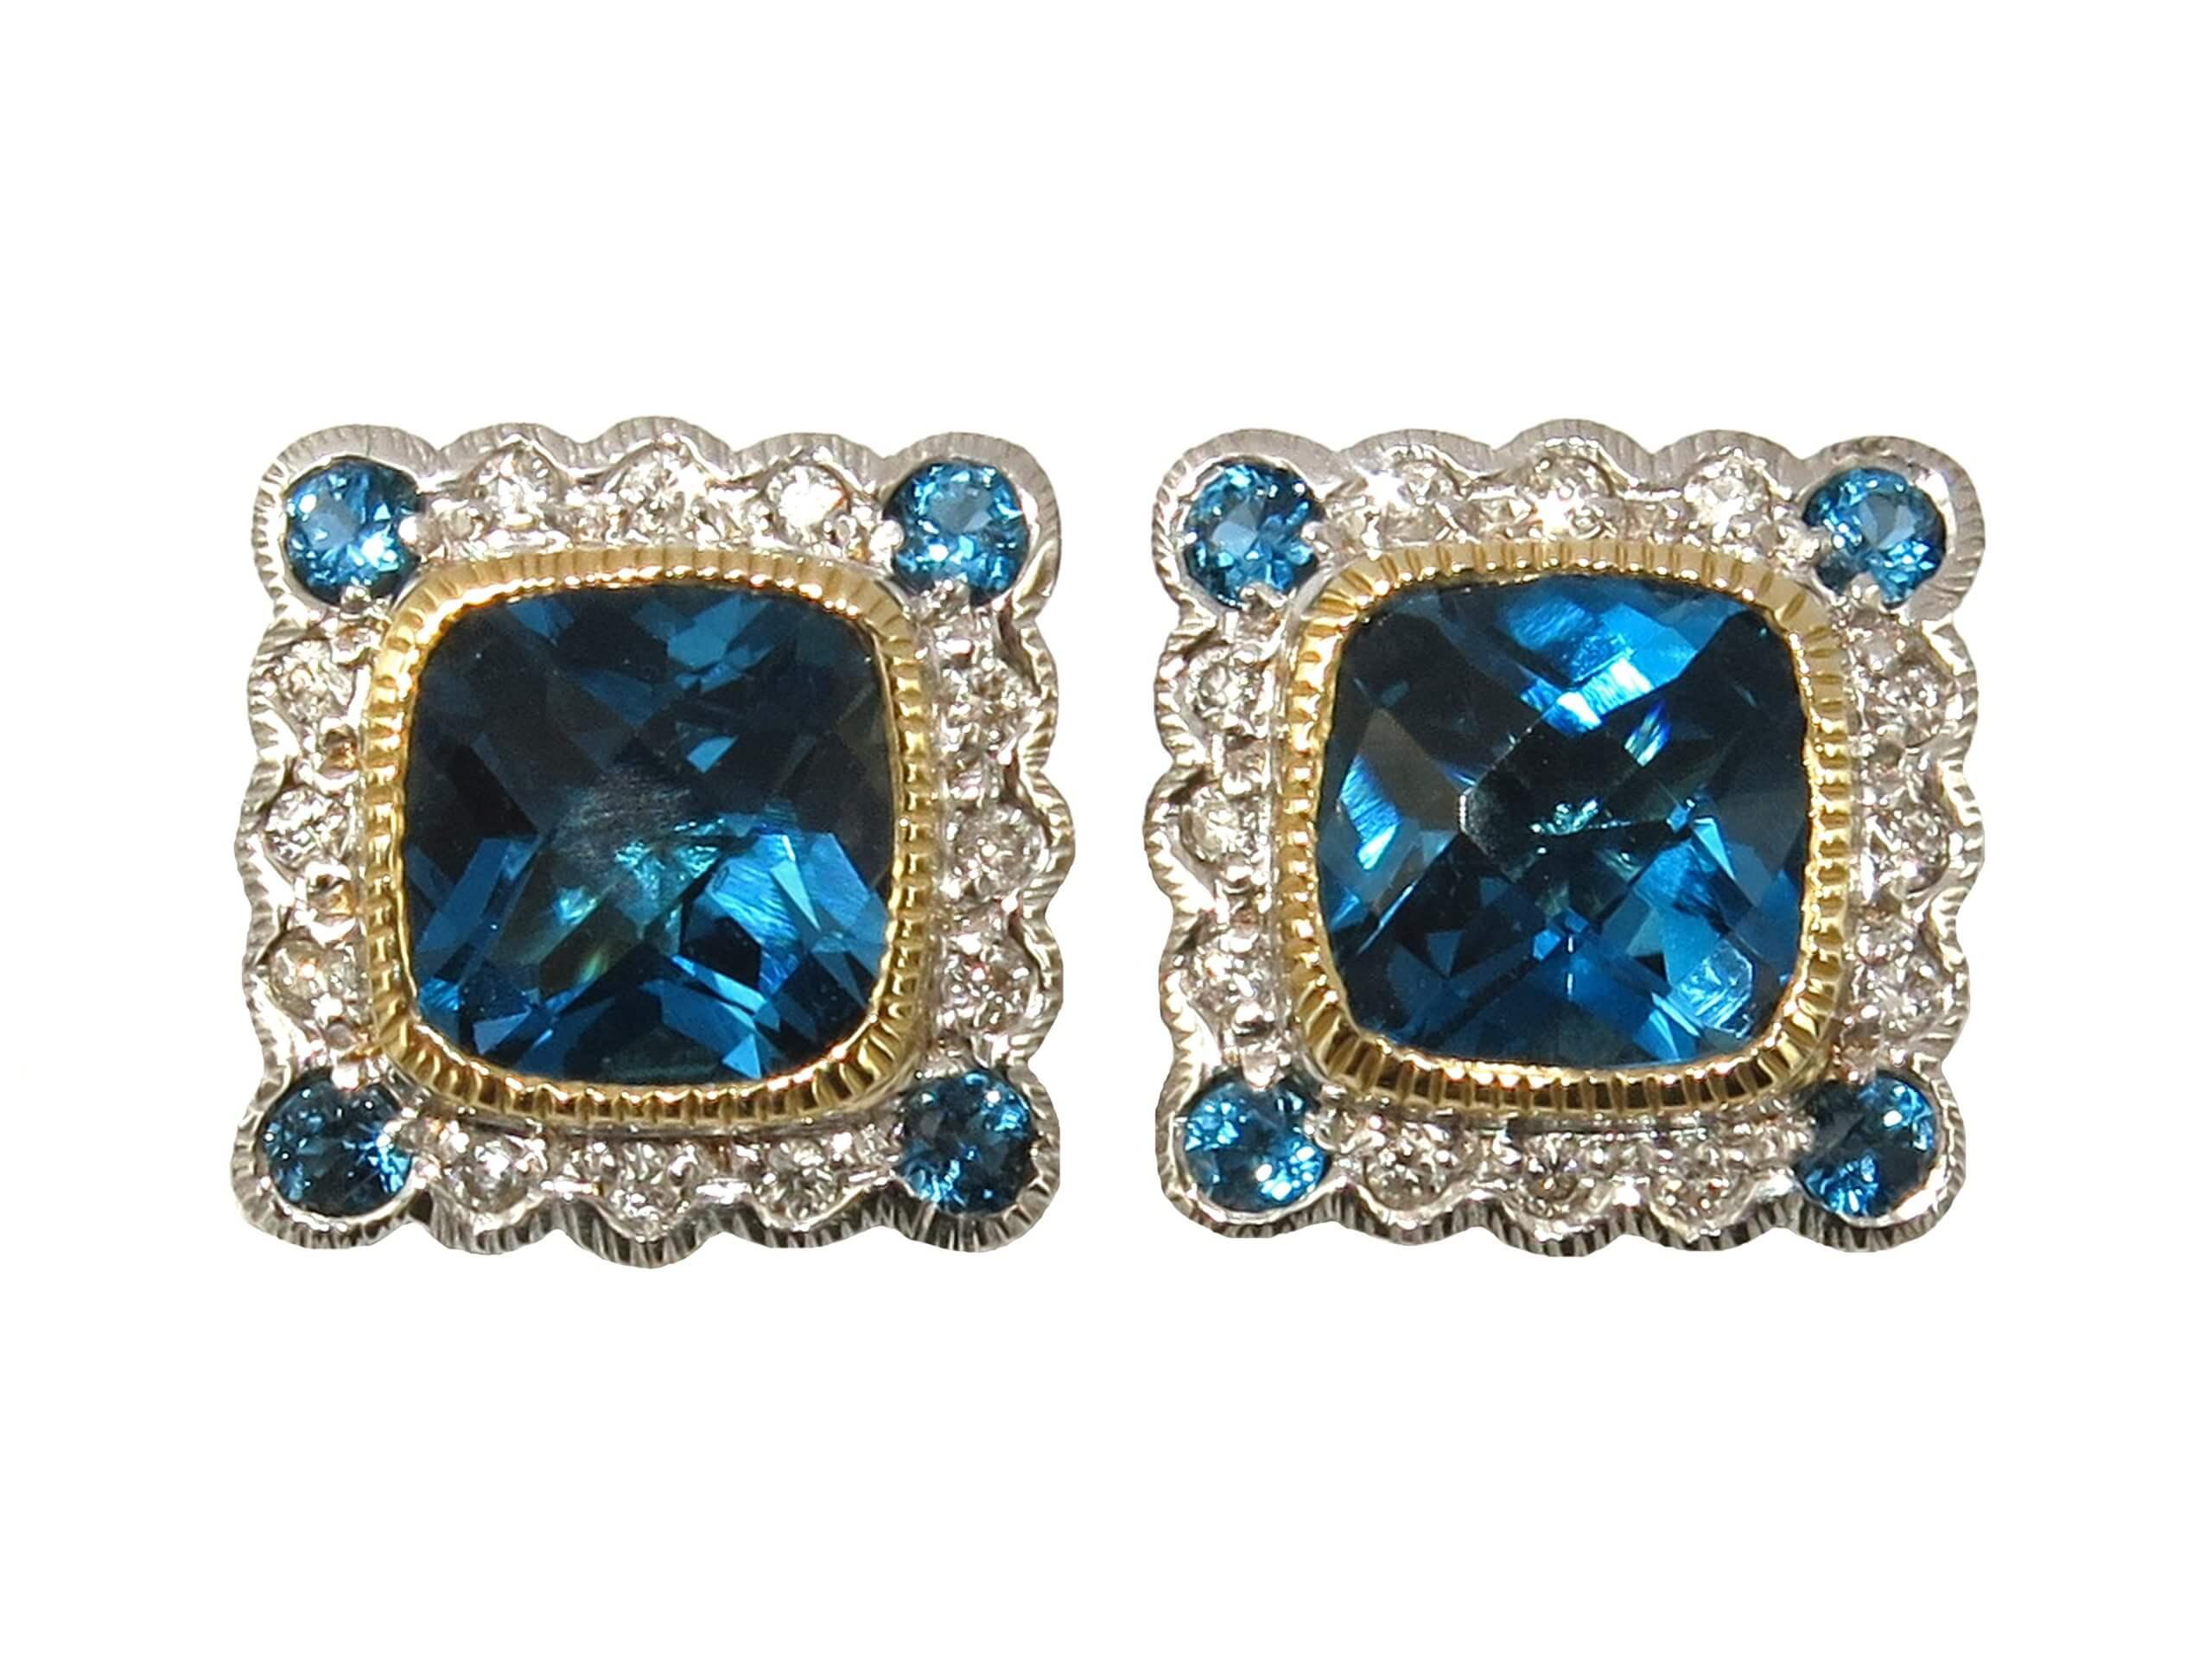 LONDON BLUE TOPAZ AND DIAMOND STUDS MJ24425